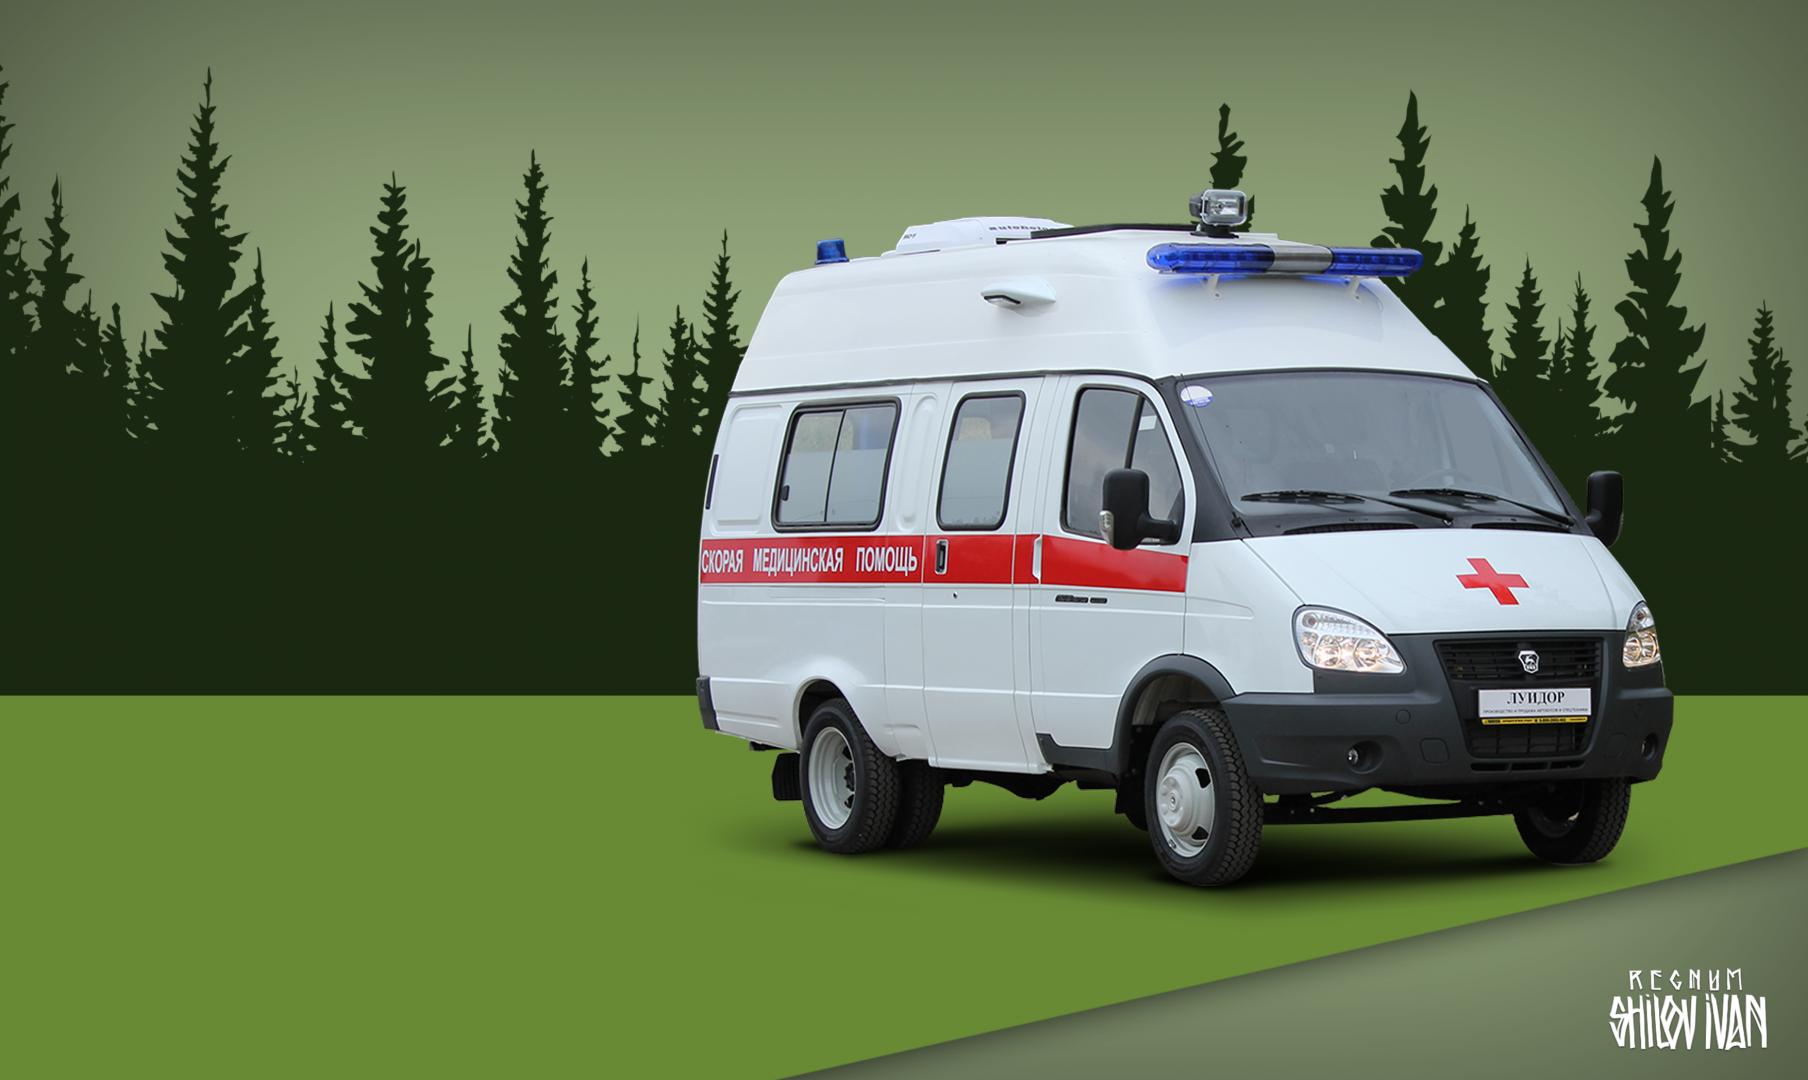 Скорая помощь в лизинг: объявлен автотендер на 1,3 млрд рублей